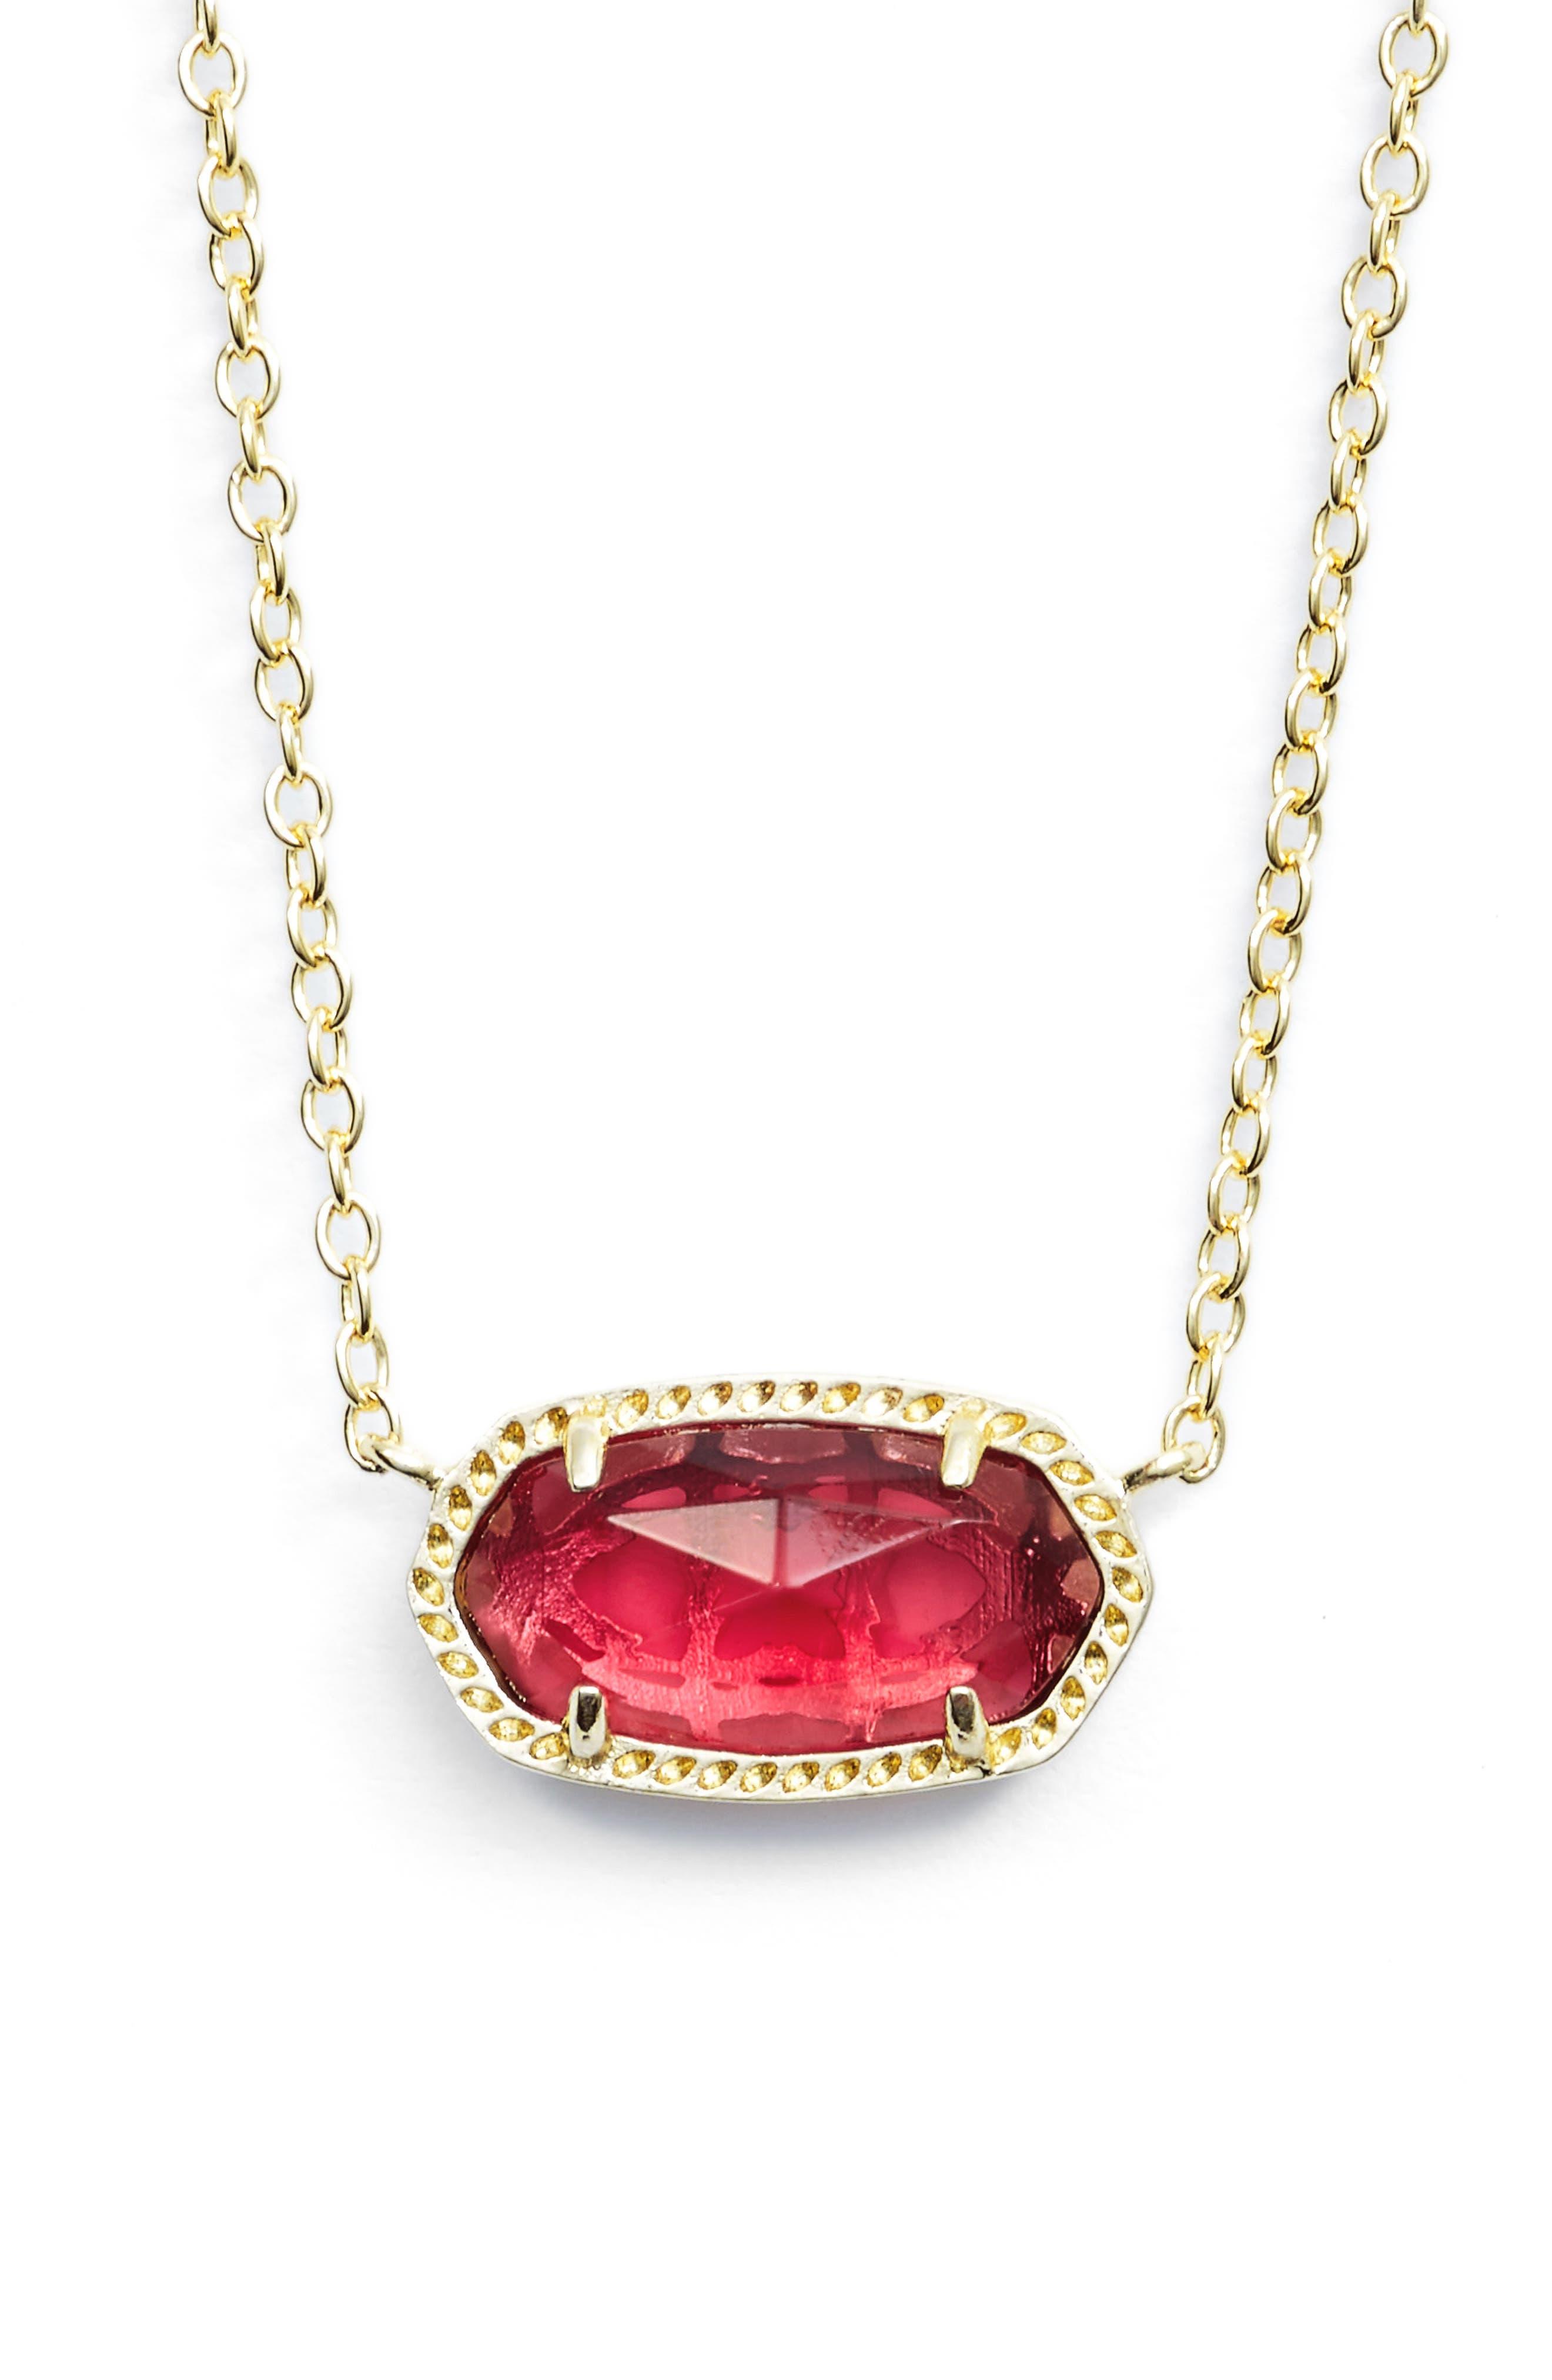 KENDRA SCOTT, Elisa Birthstone Pendant Necklace, Main thumbnail 1, color, JANUARY/BERRY/GOLD